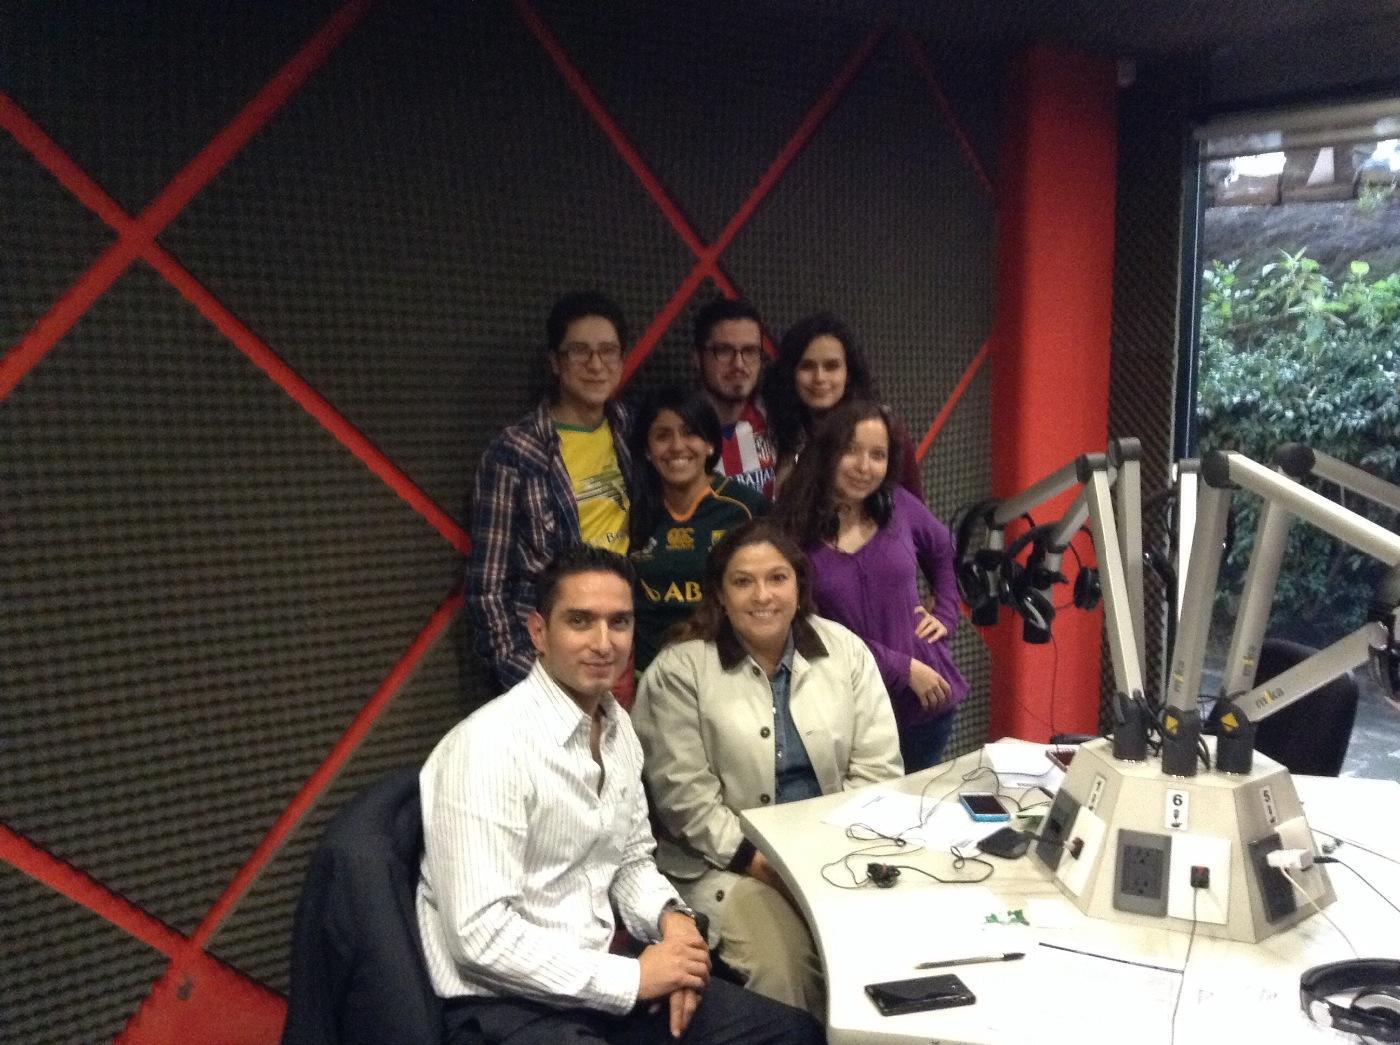 El pasajero de la entrevista de hoy: Lic. Fabián Alejandro Calderón Director de Banquetes Live Aqua México City. http://t.co/7tj4EKy053